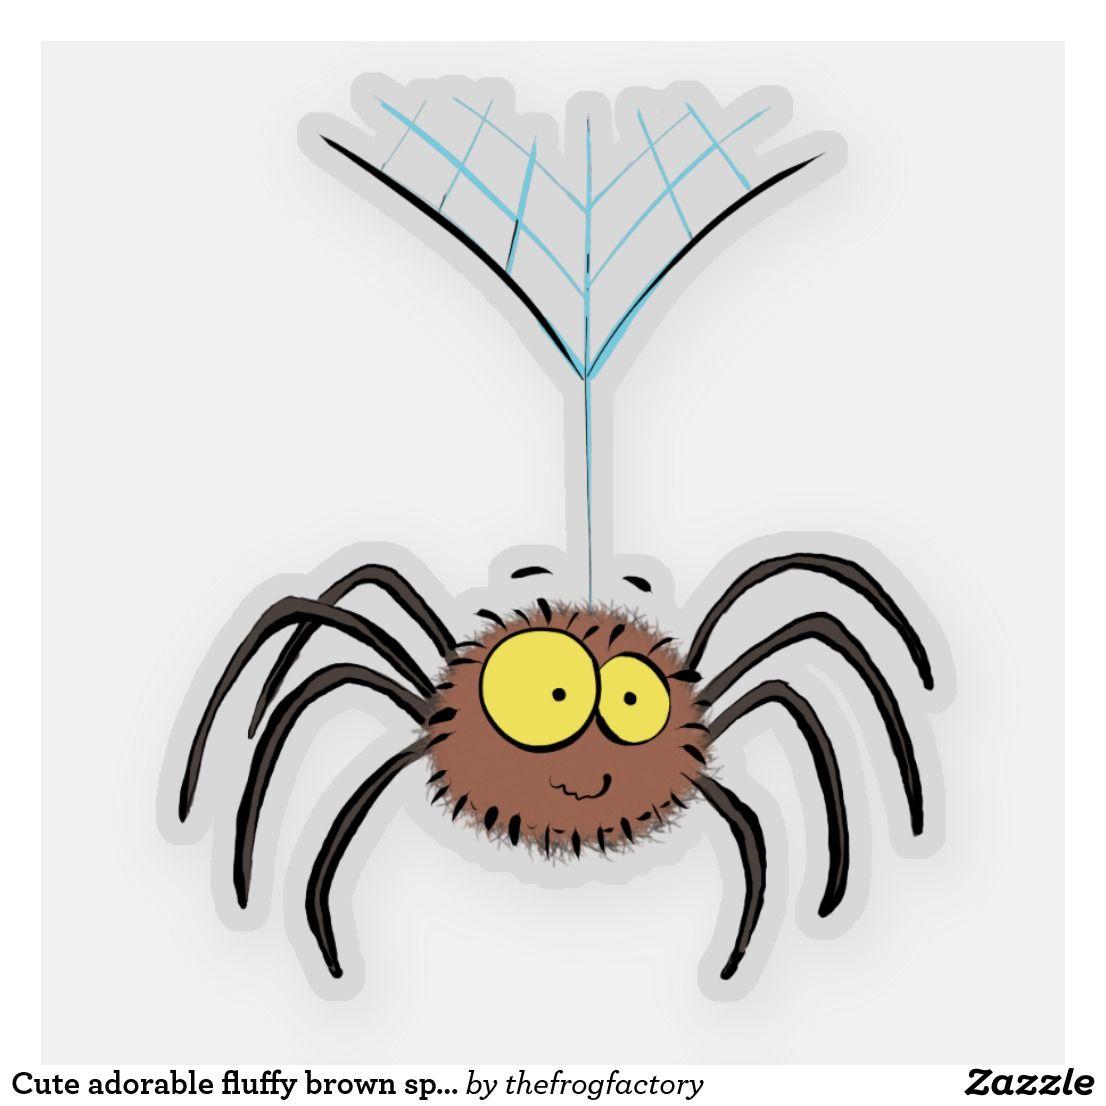 Cute Adorable Fluffy Brown Spider Cartoon Sticker Spider Drawing Spider Cartoon Cartoon Stickers